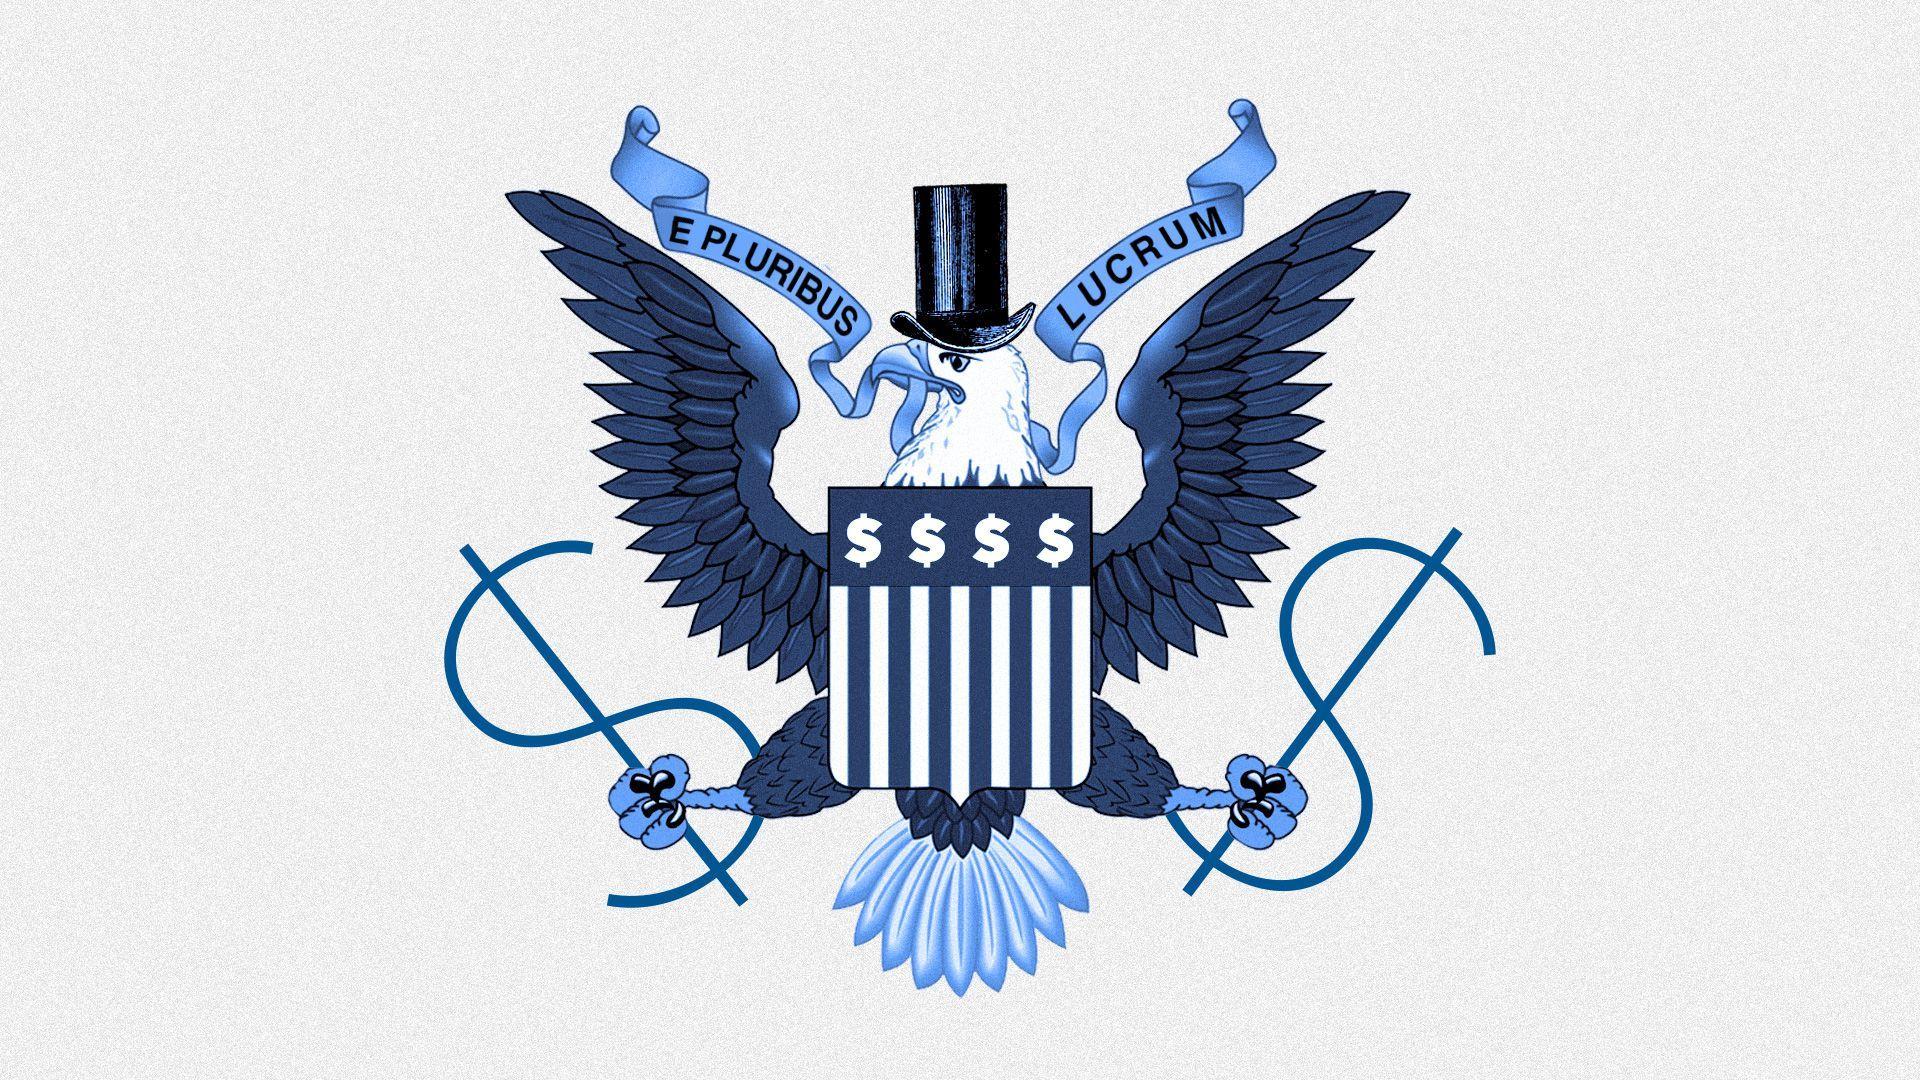 Illustratoin of U.S. seal